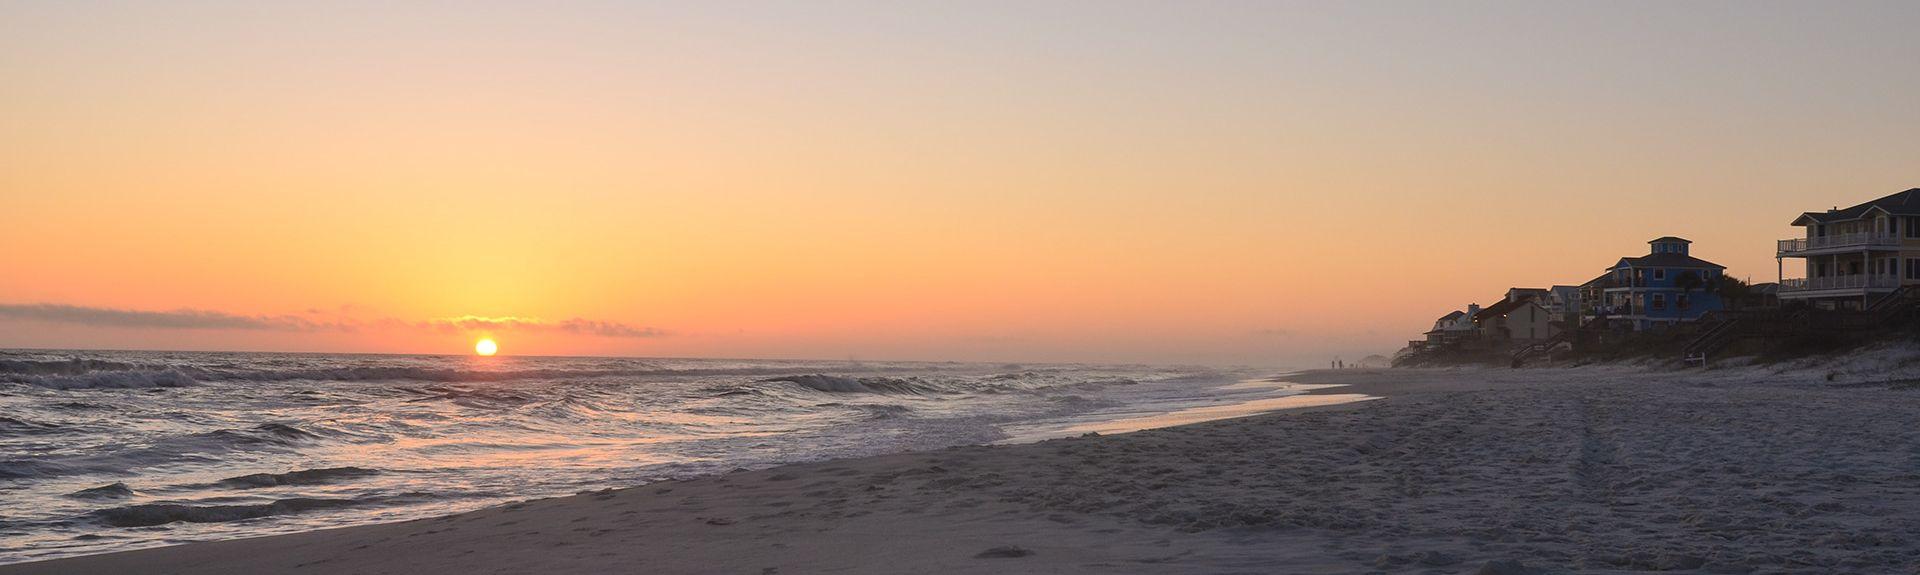 Seacrest Beach, Panama City Beach, Florida, United States of America